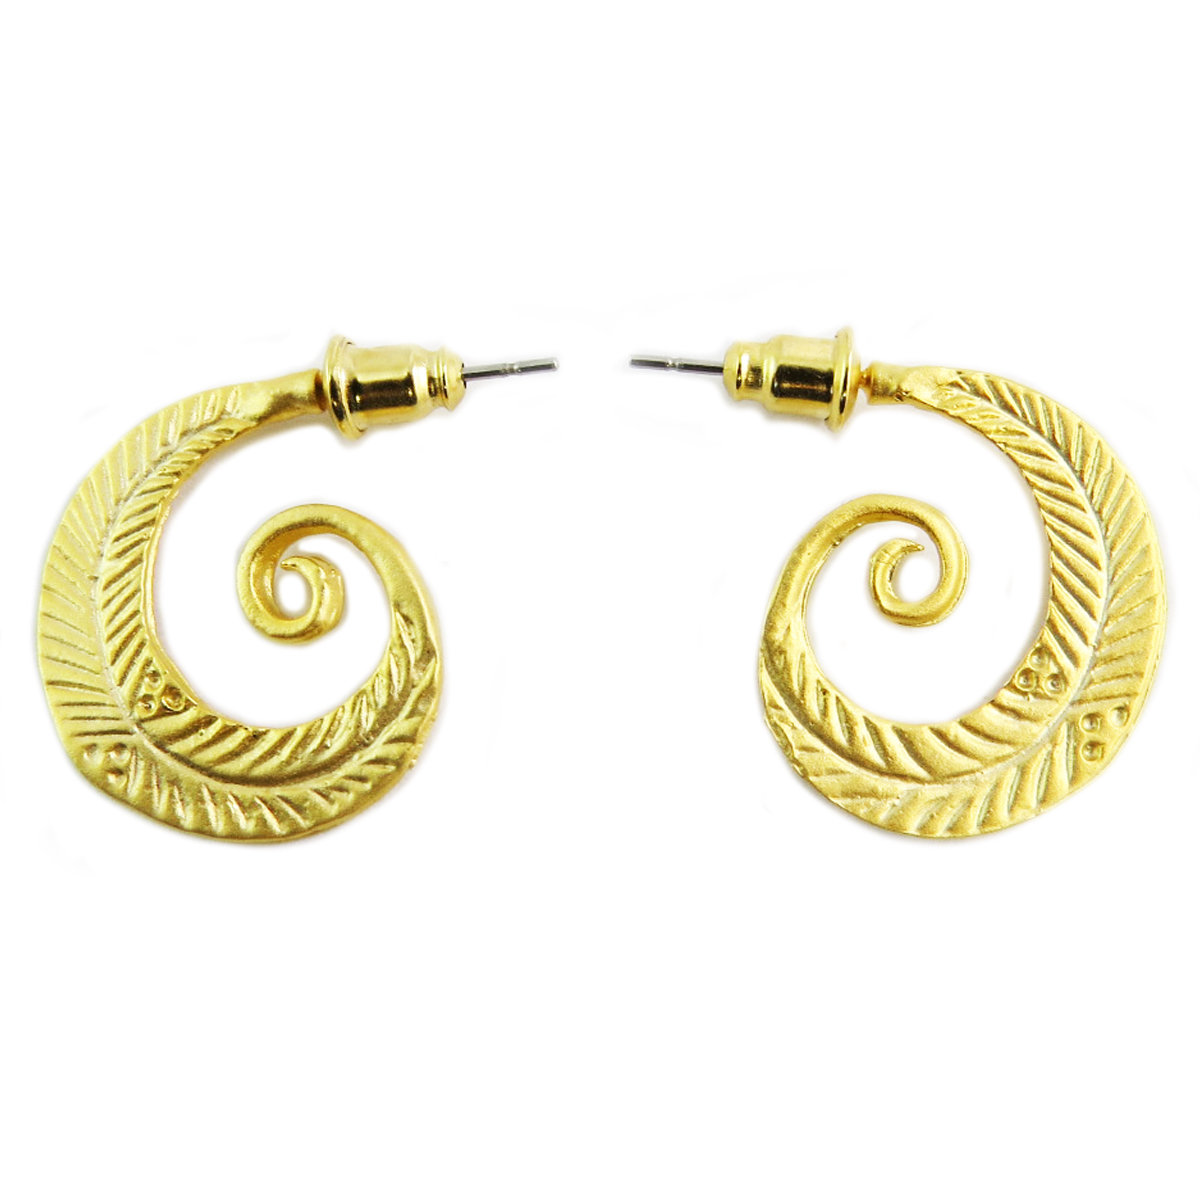 Boucles artisanales \'Cléopatra\' doré  - 20 mm - [Q5641]